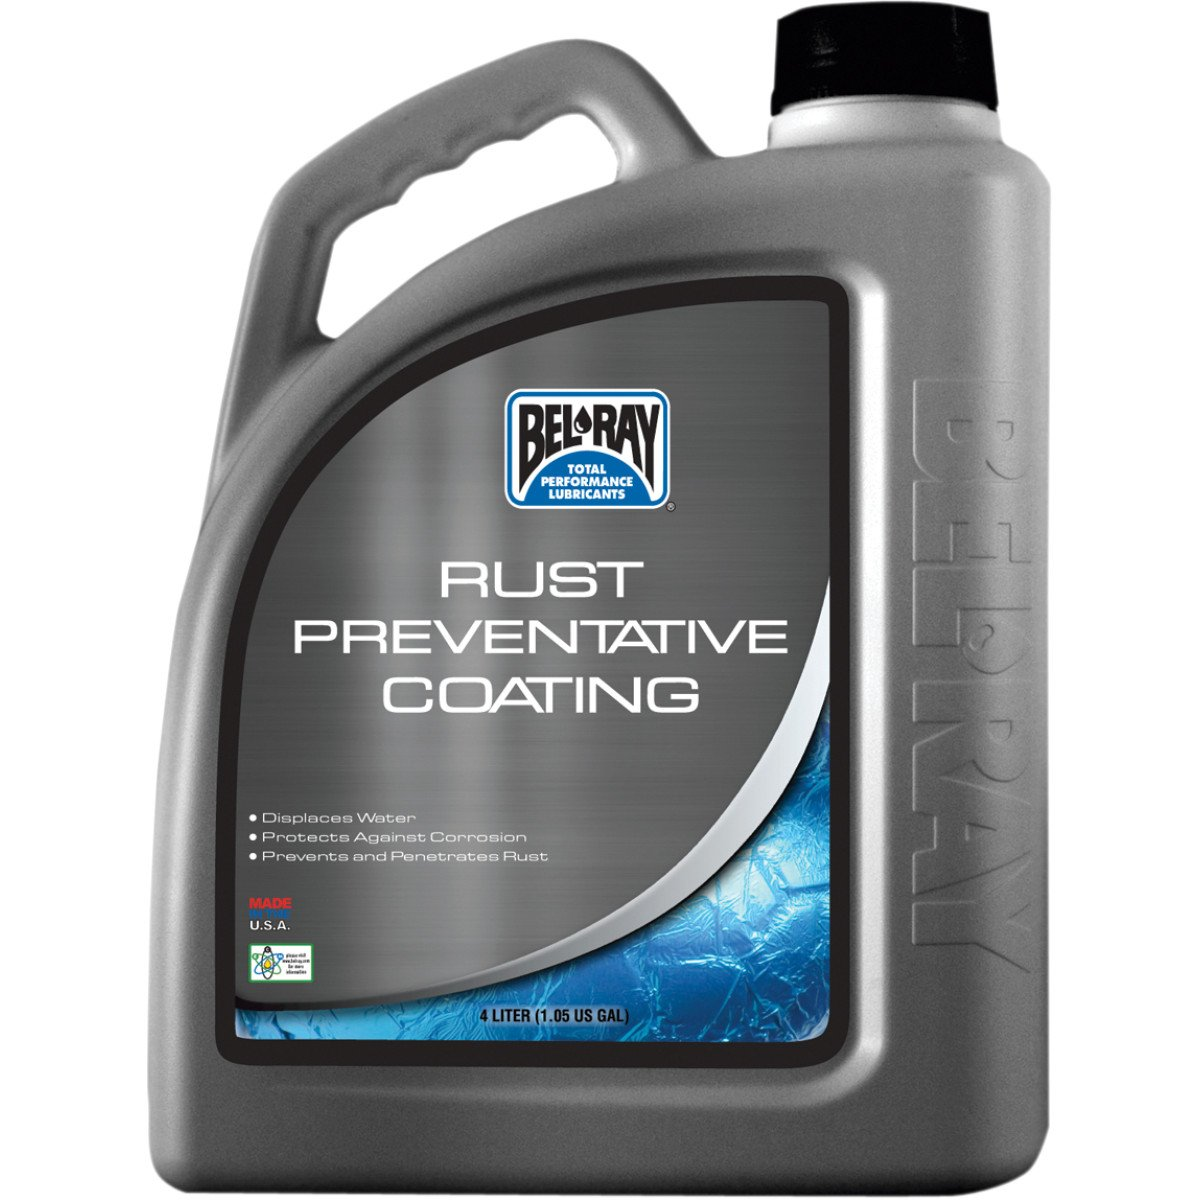 Bel Ray Marine Rust Preventative Coating, 4 Liter 99706-BT4